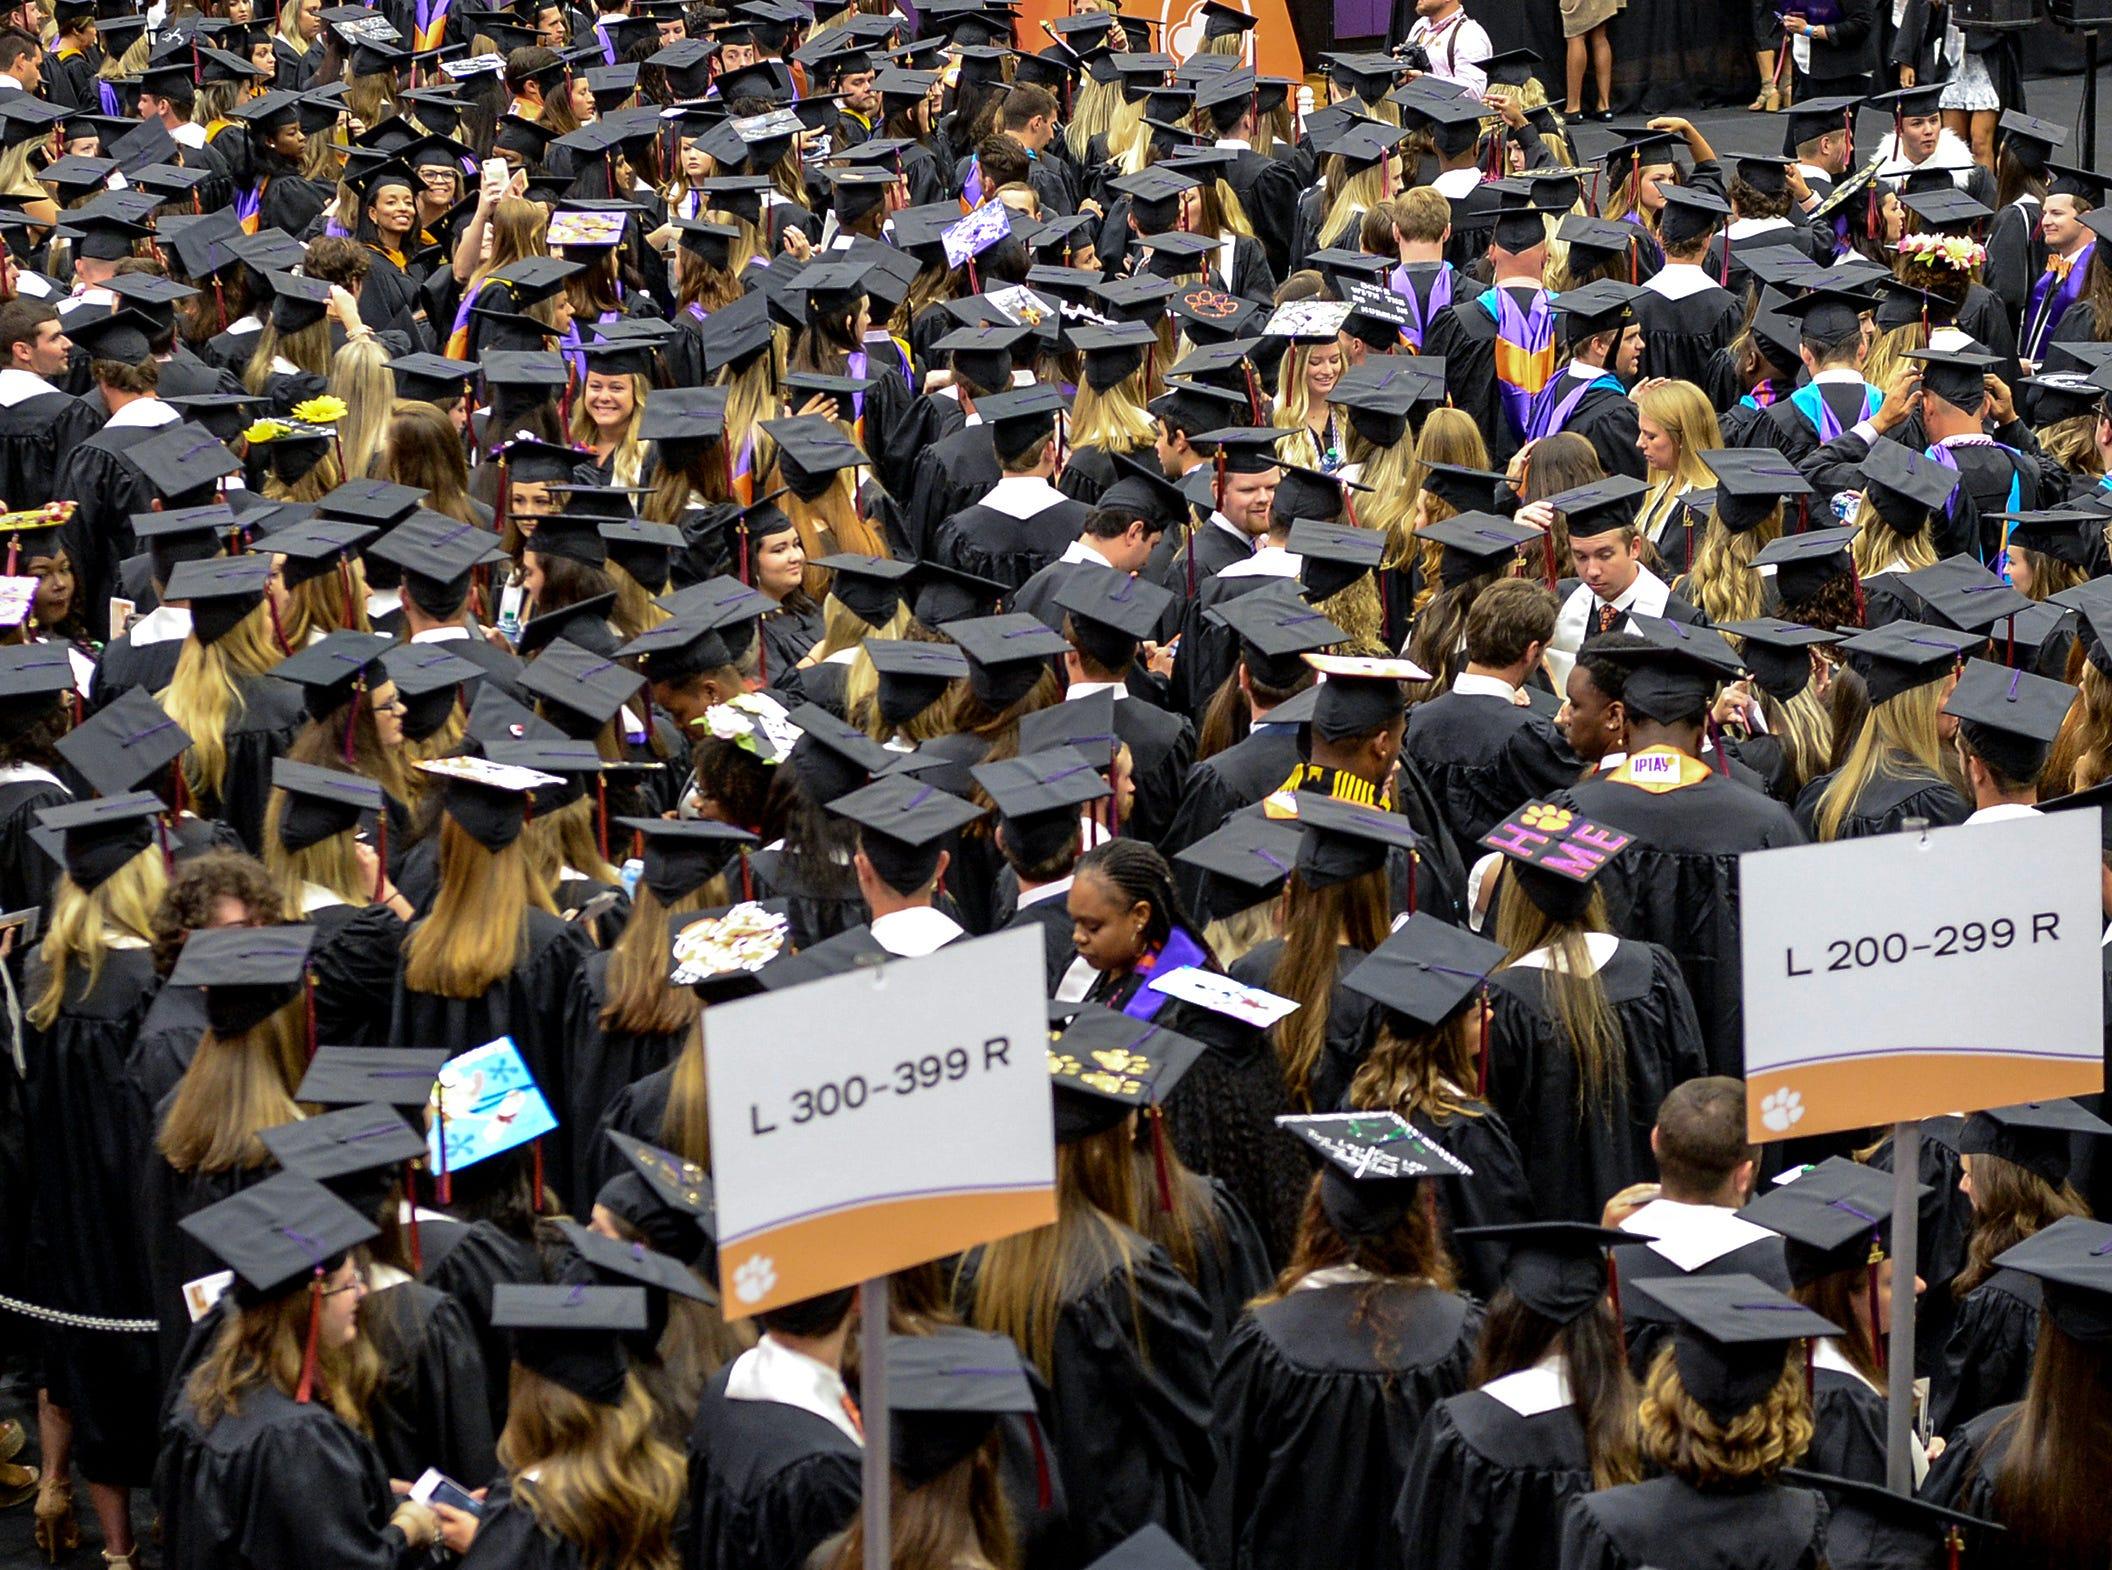 Clemson graduates line up before Clemson University commencement ceremonies in Littlejohn Coliseum in Clemson Friday, May 10, 2019.